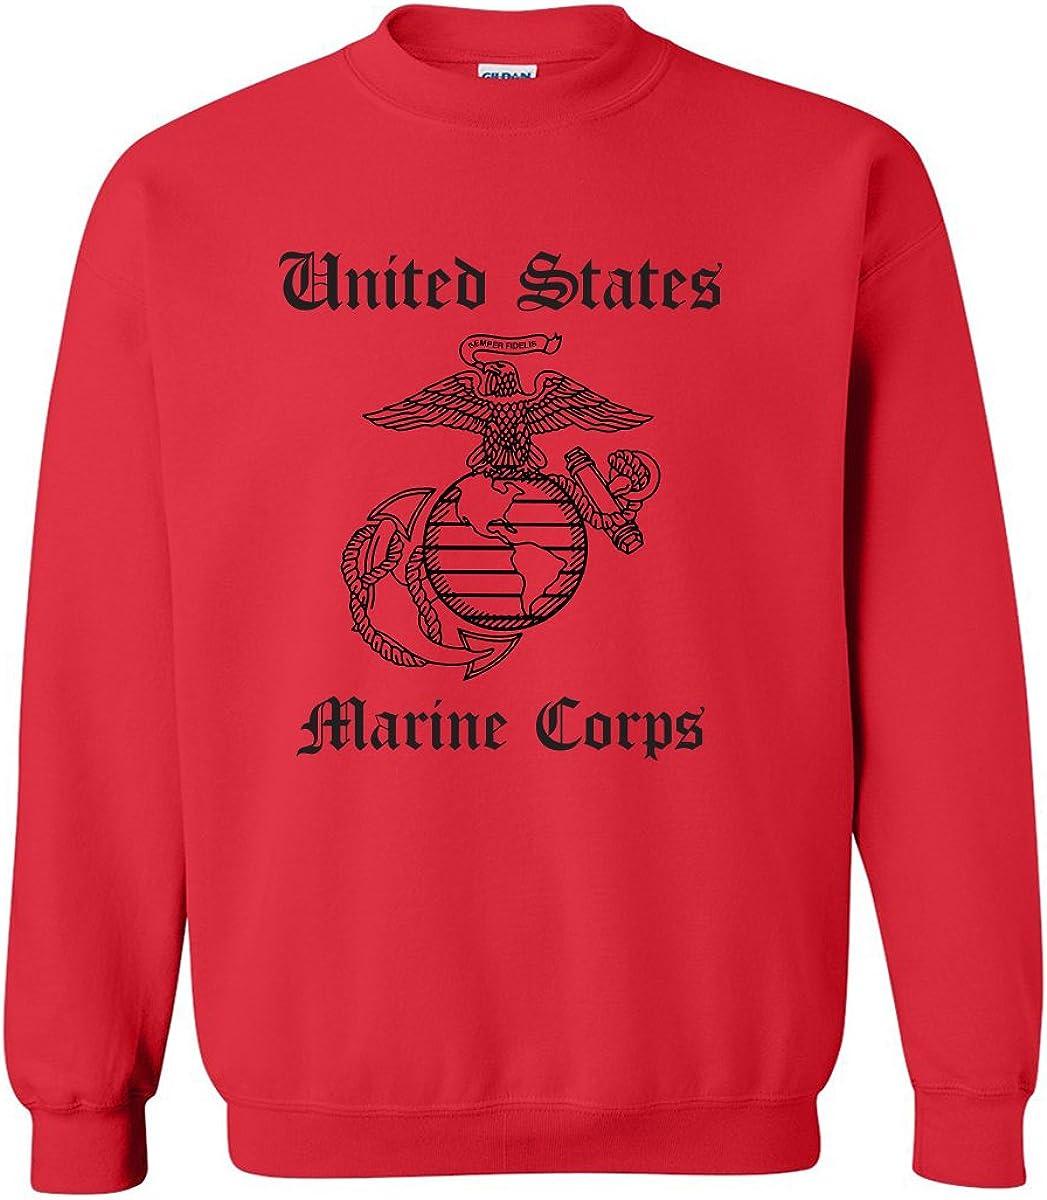 United States Marine Corps Crewneck Sweatshirt